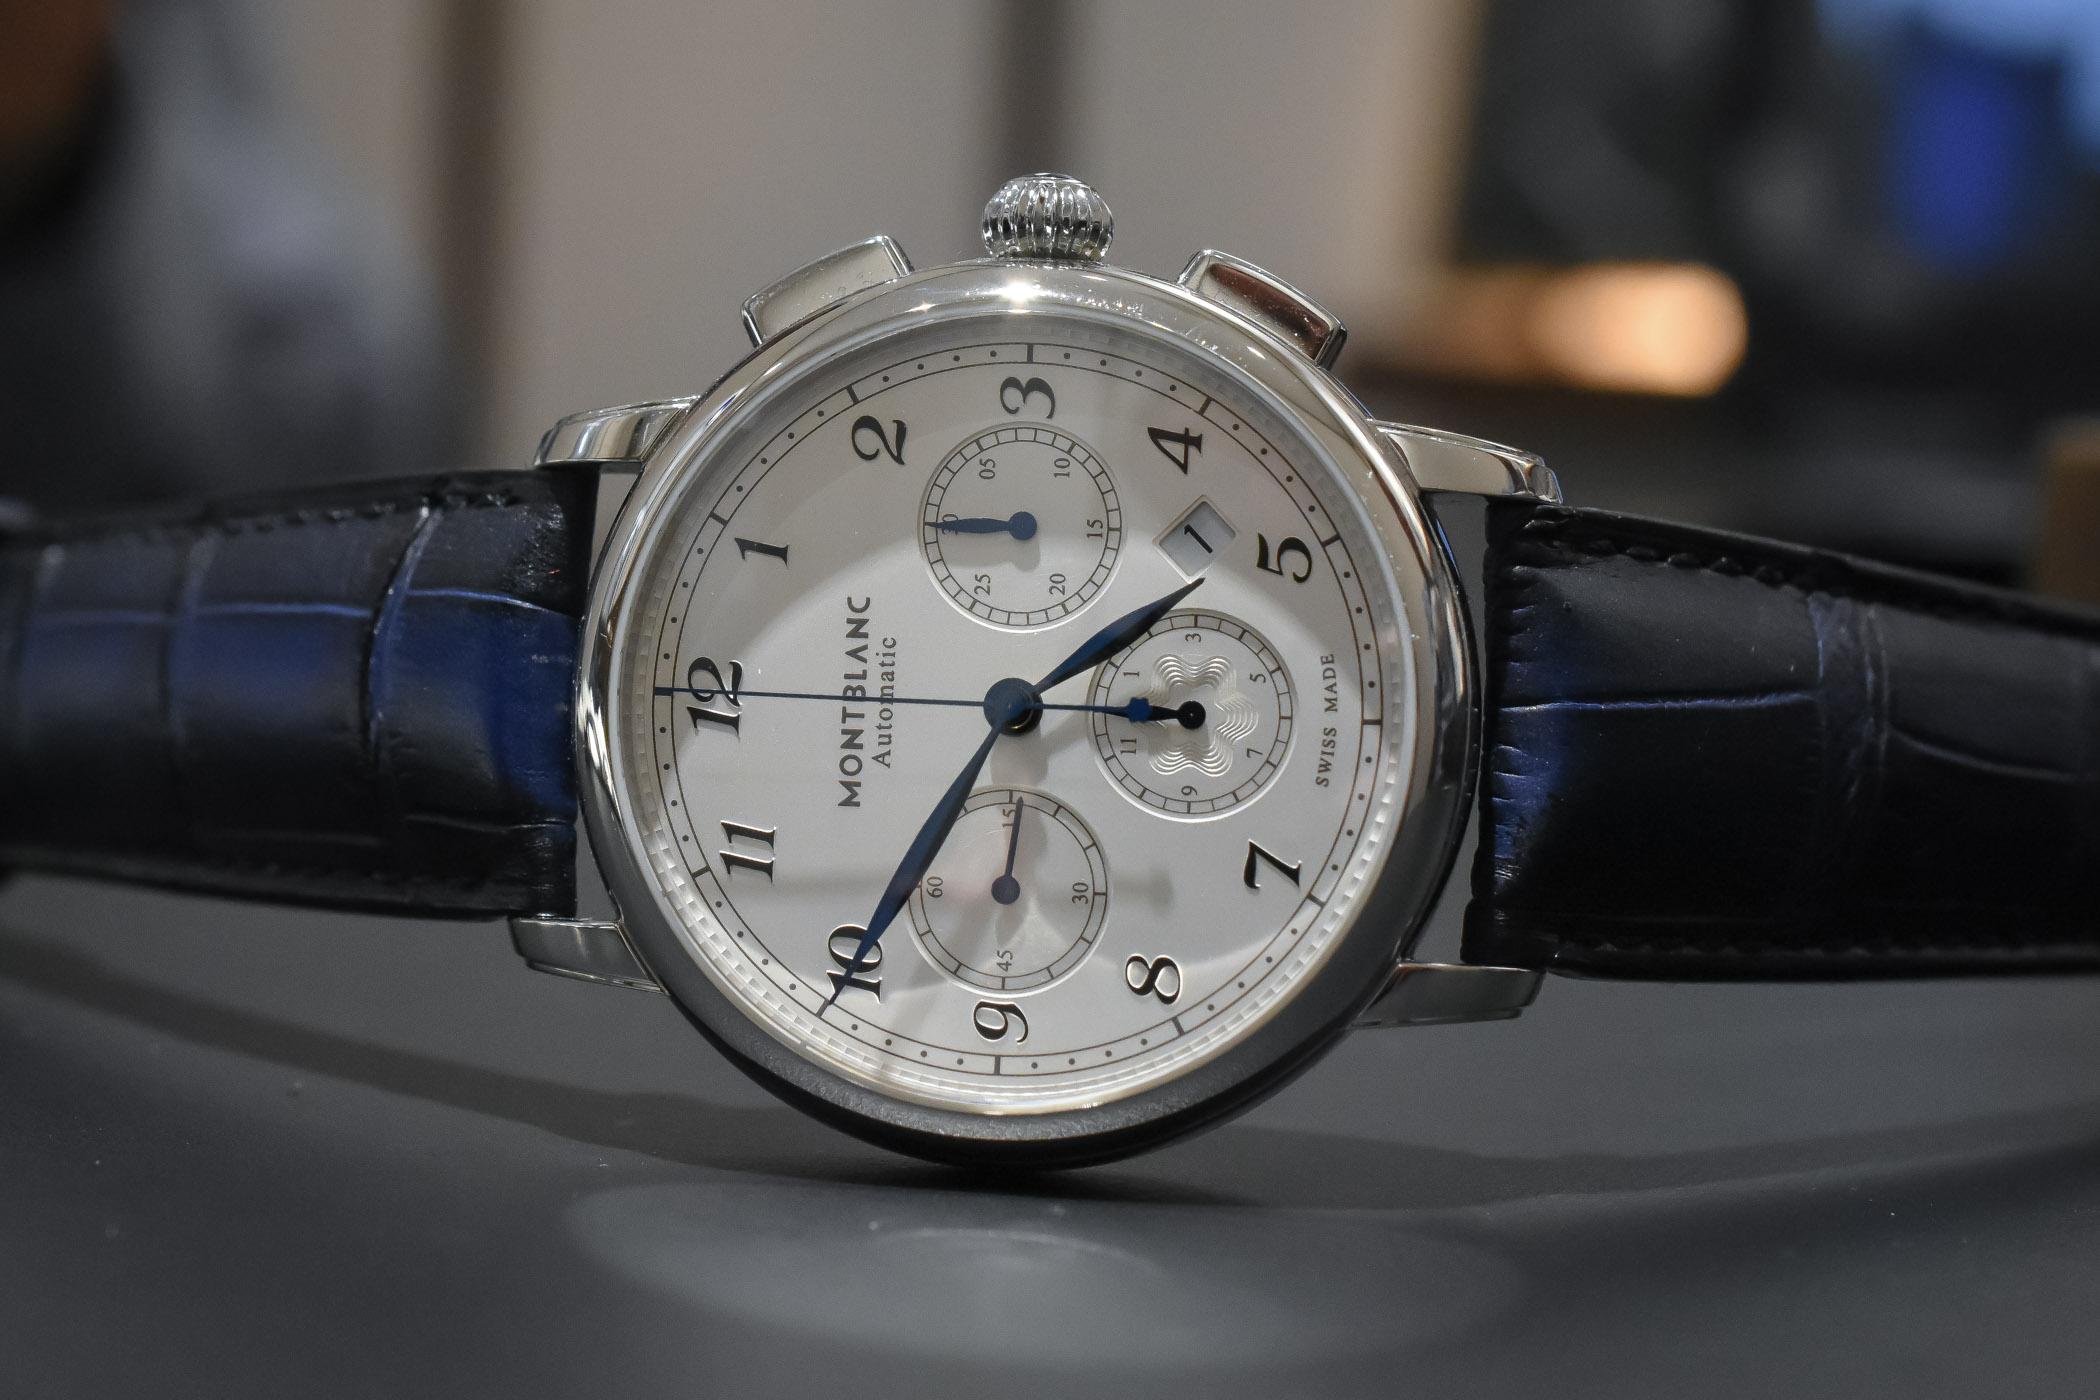 9d7400600 مستوحاةٌ من تراث مينرفا.. مواصفات ساعات Mont Blanc الفاخرة   مجلة الرجل